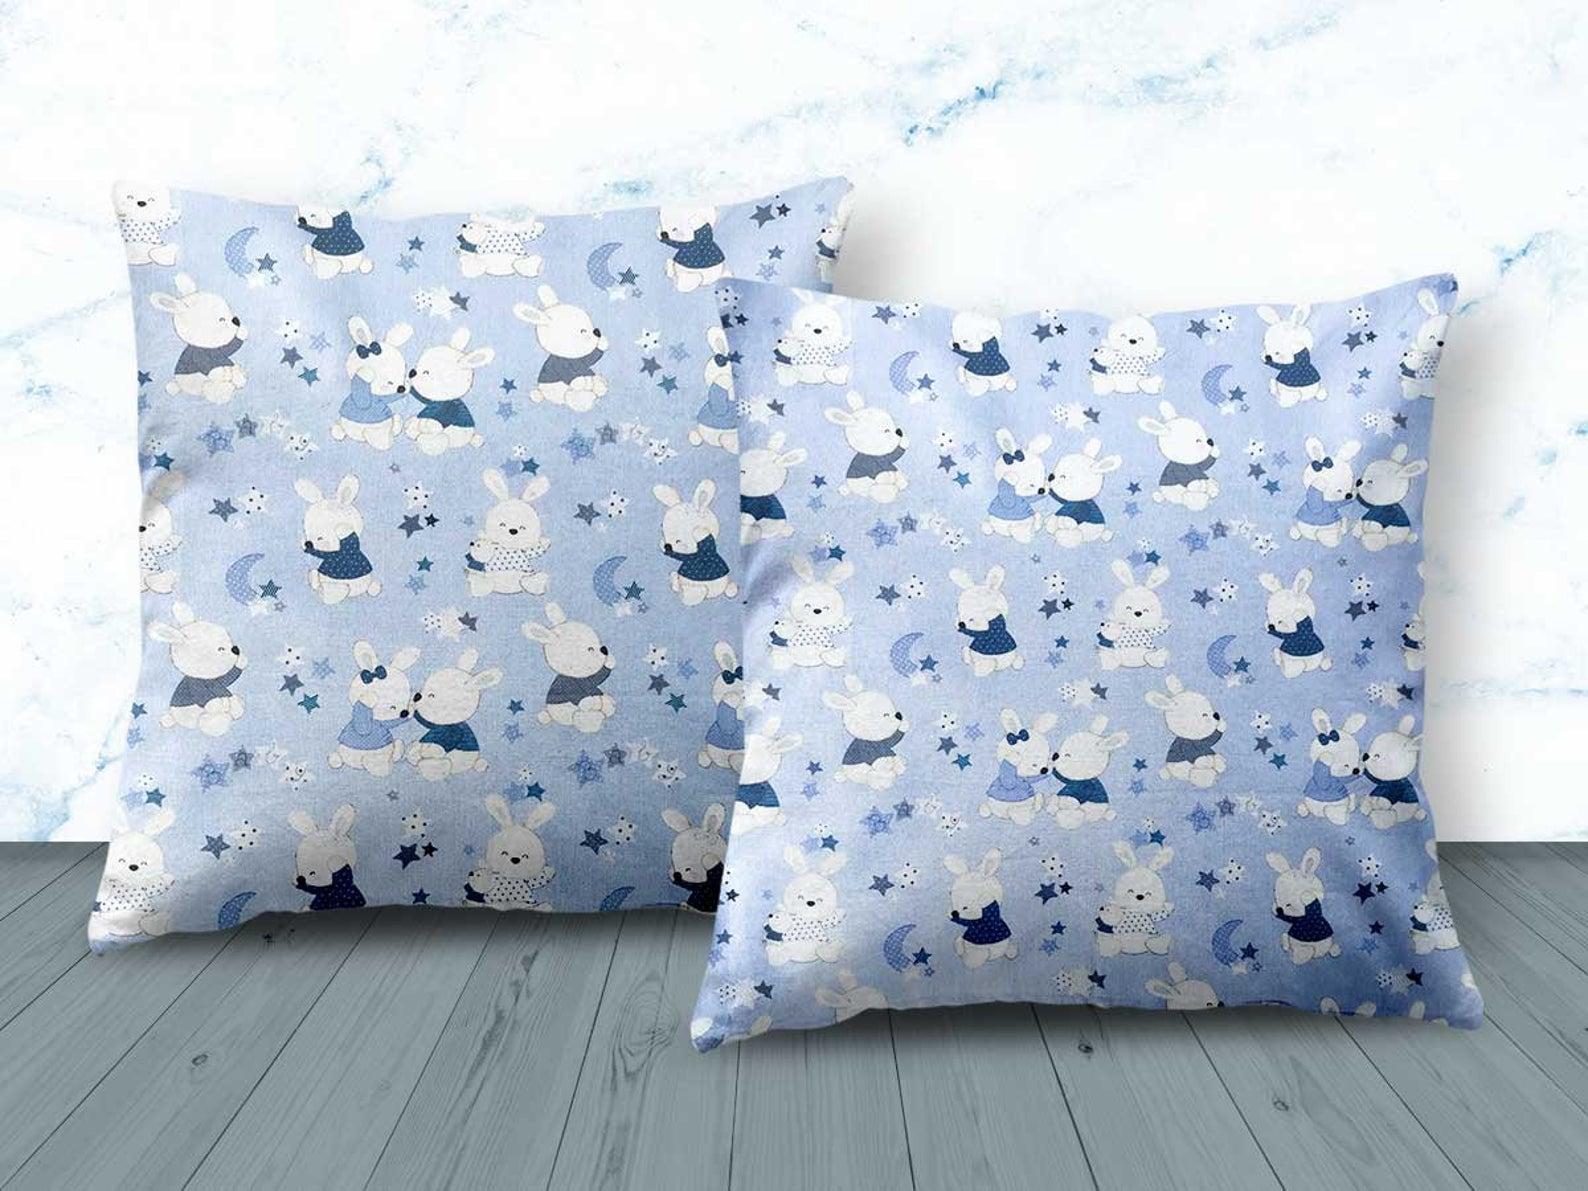 Blue Rabbit Design Cushion